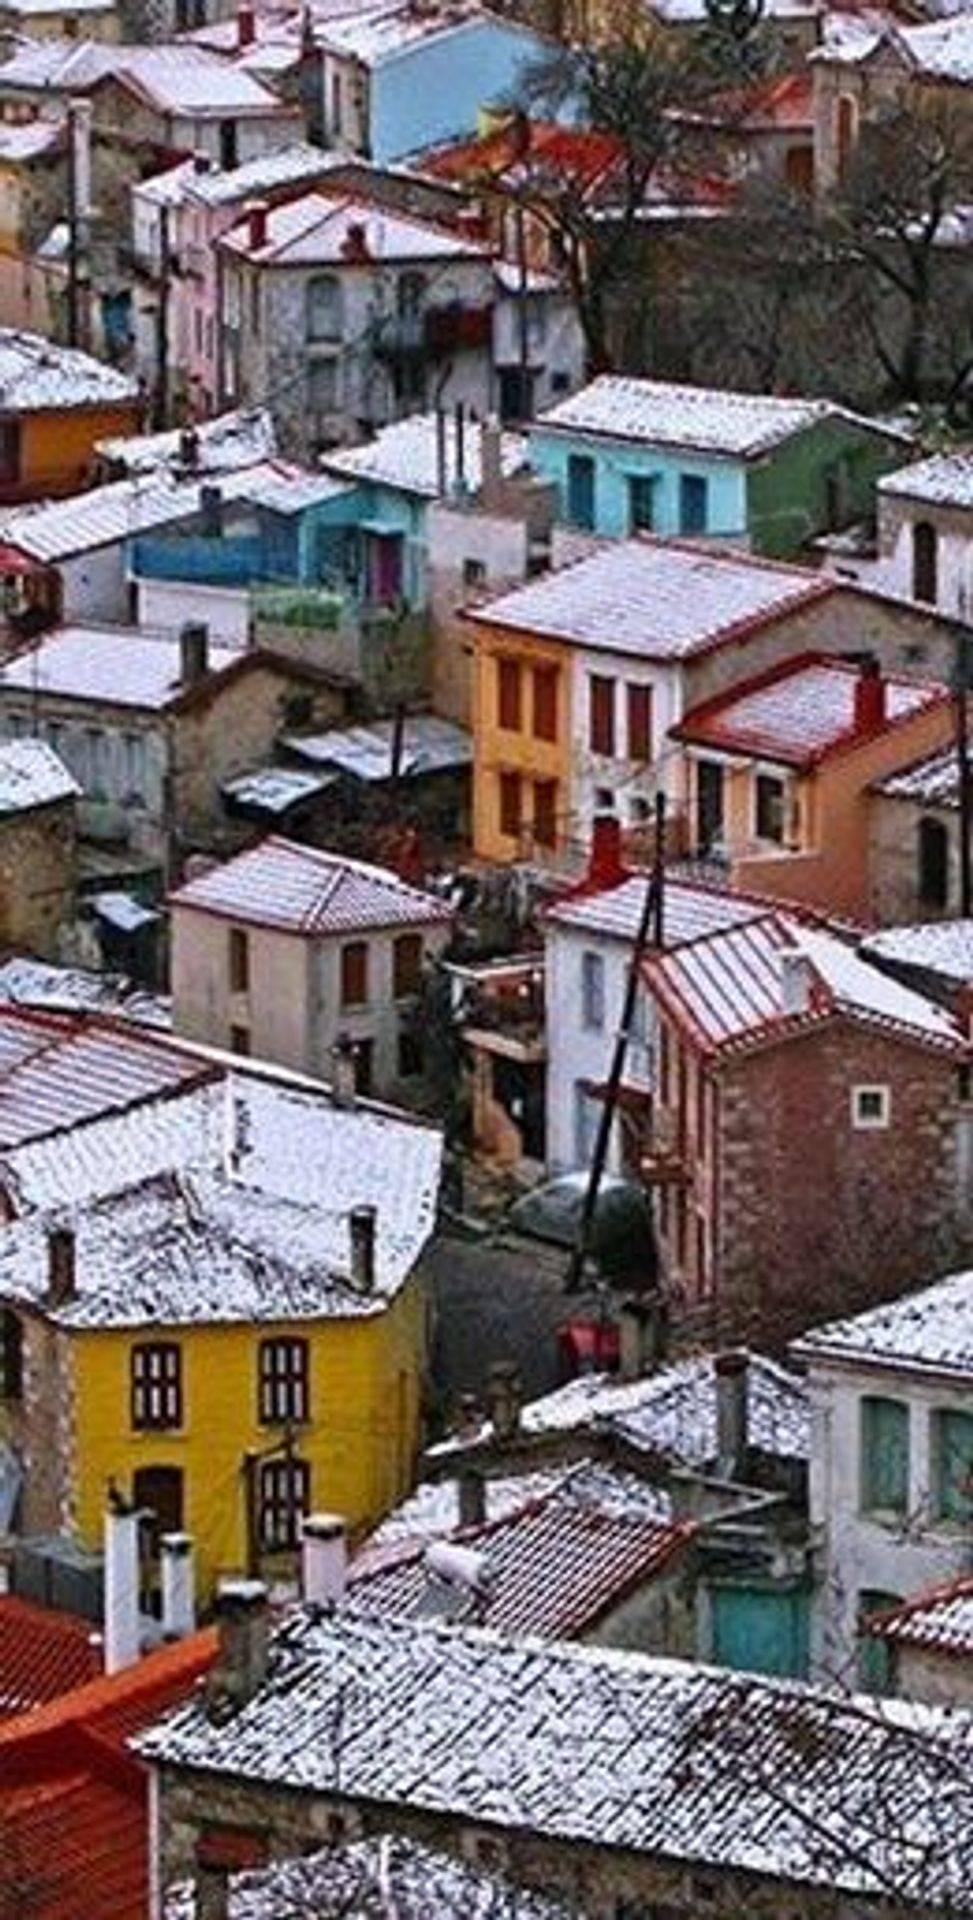 Agiasos, Lesvos island, Aegean, Snow white beauty , January 2015